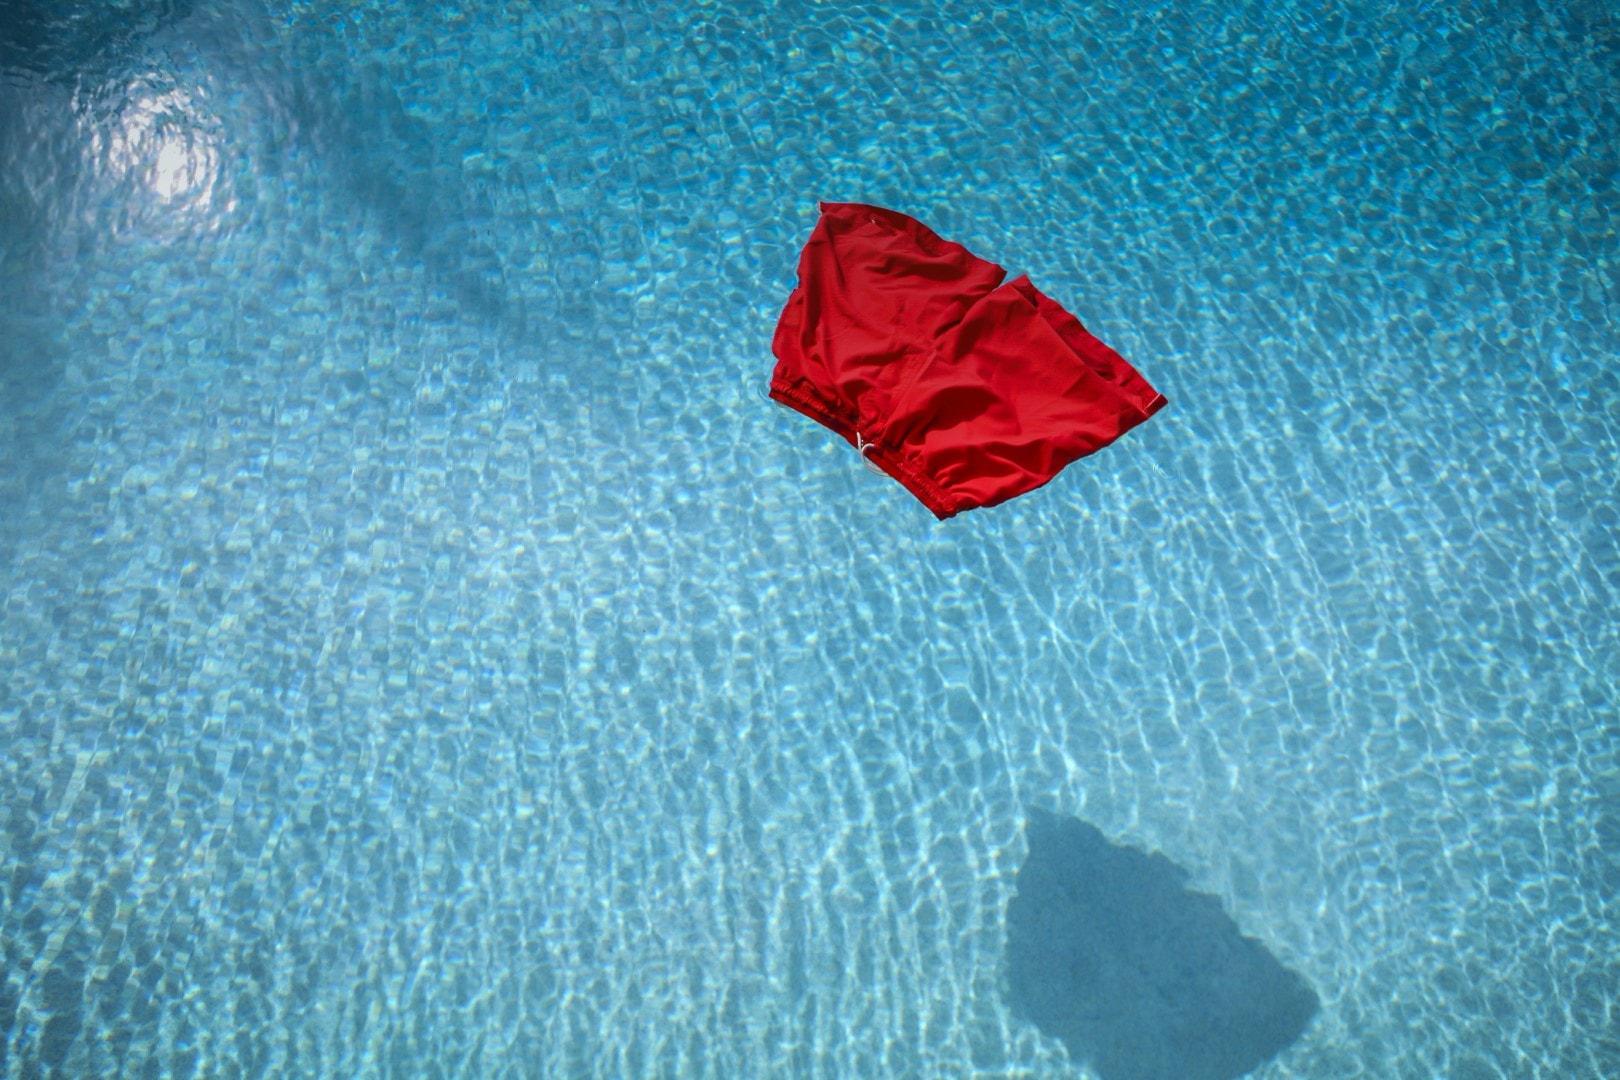 red-shorts-swimming-pool-Large.jpeg